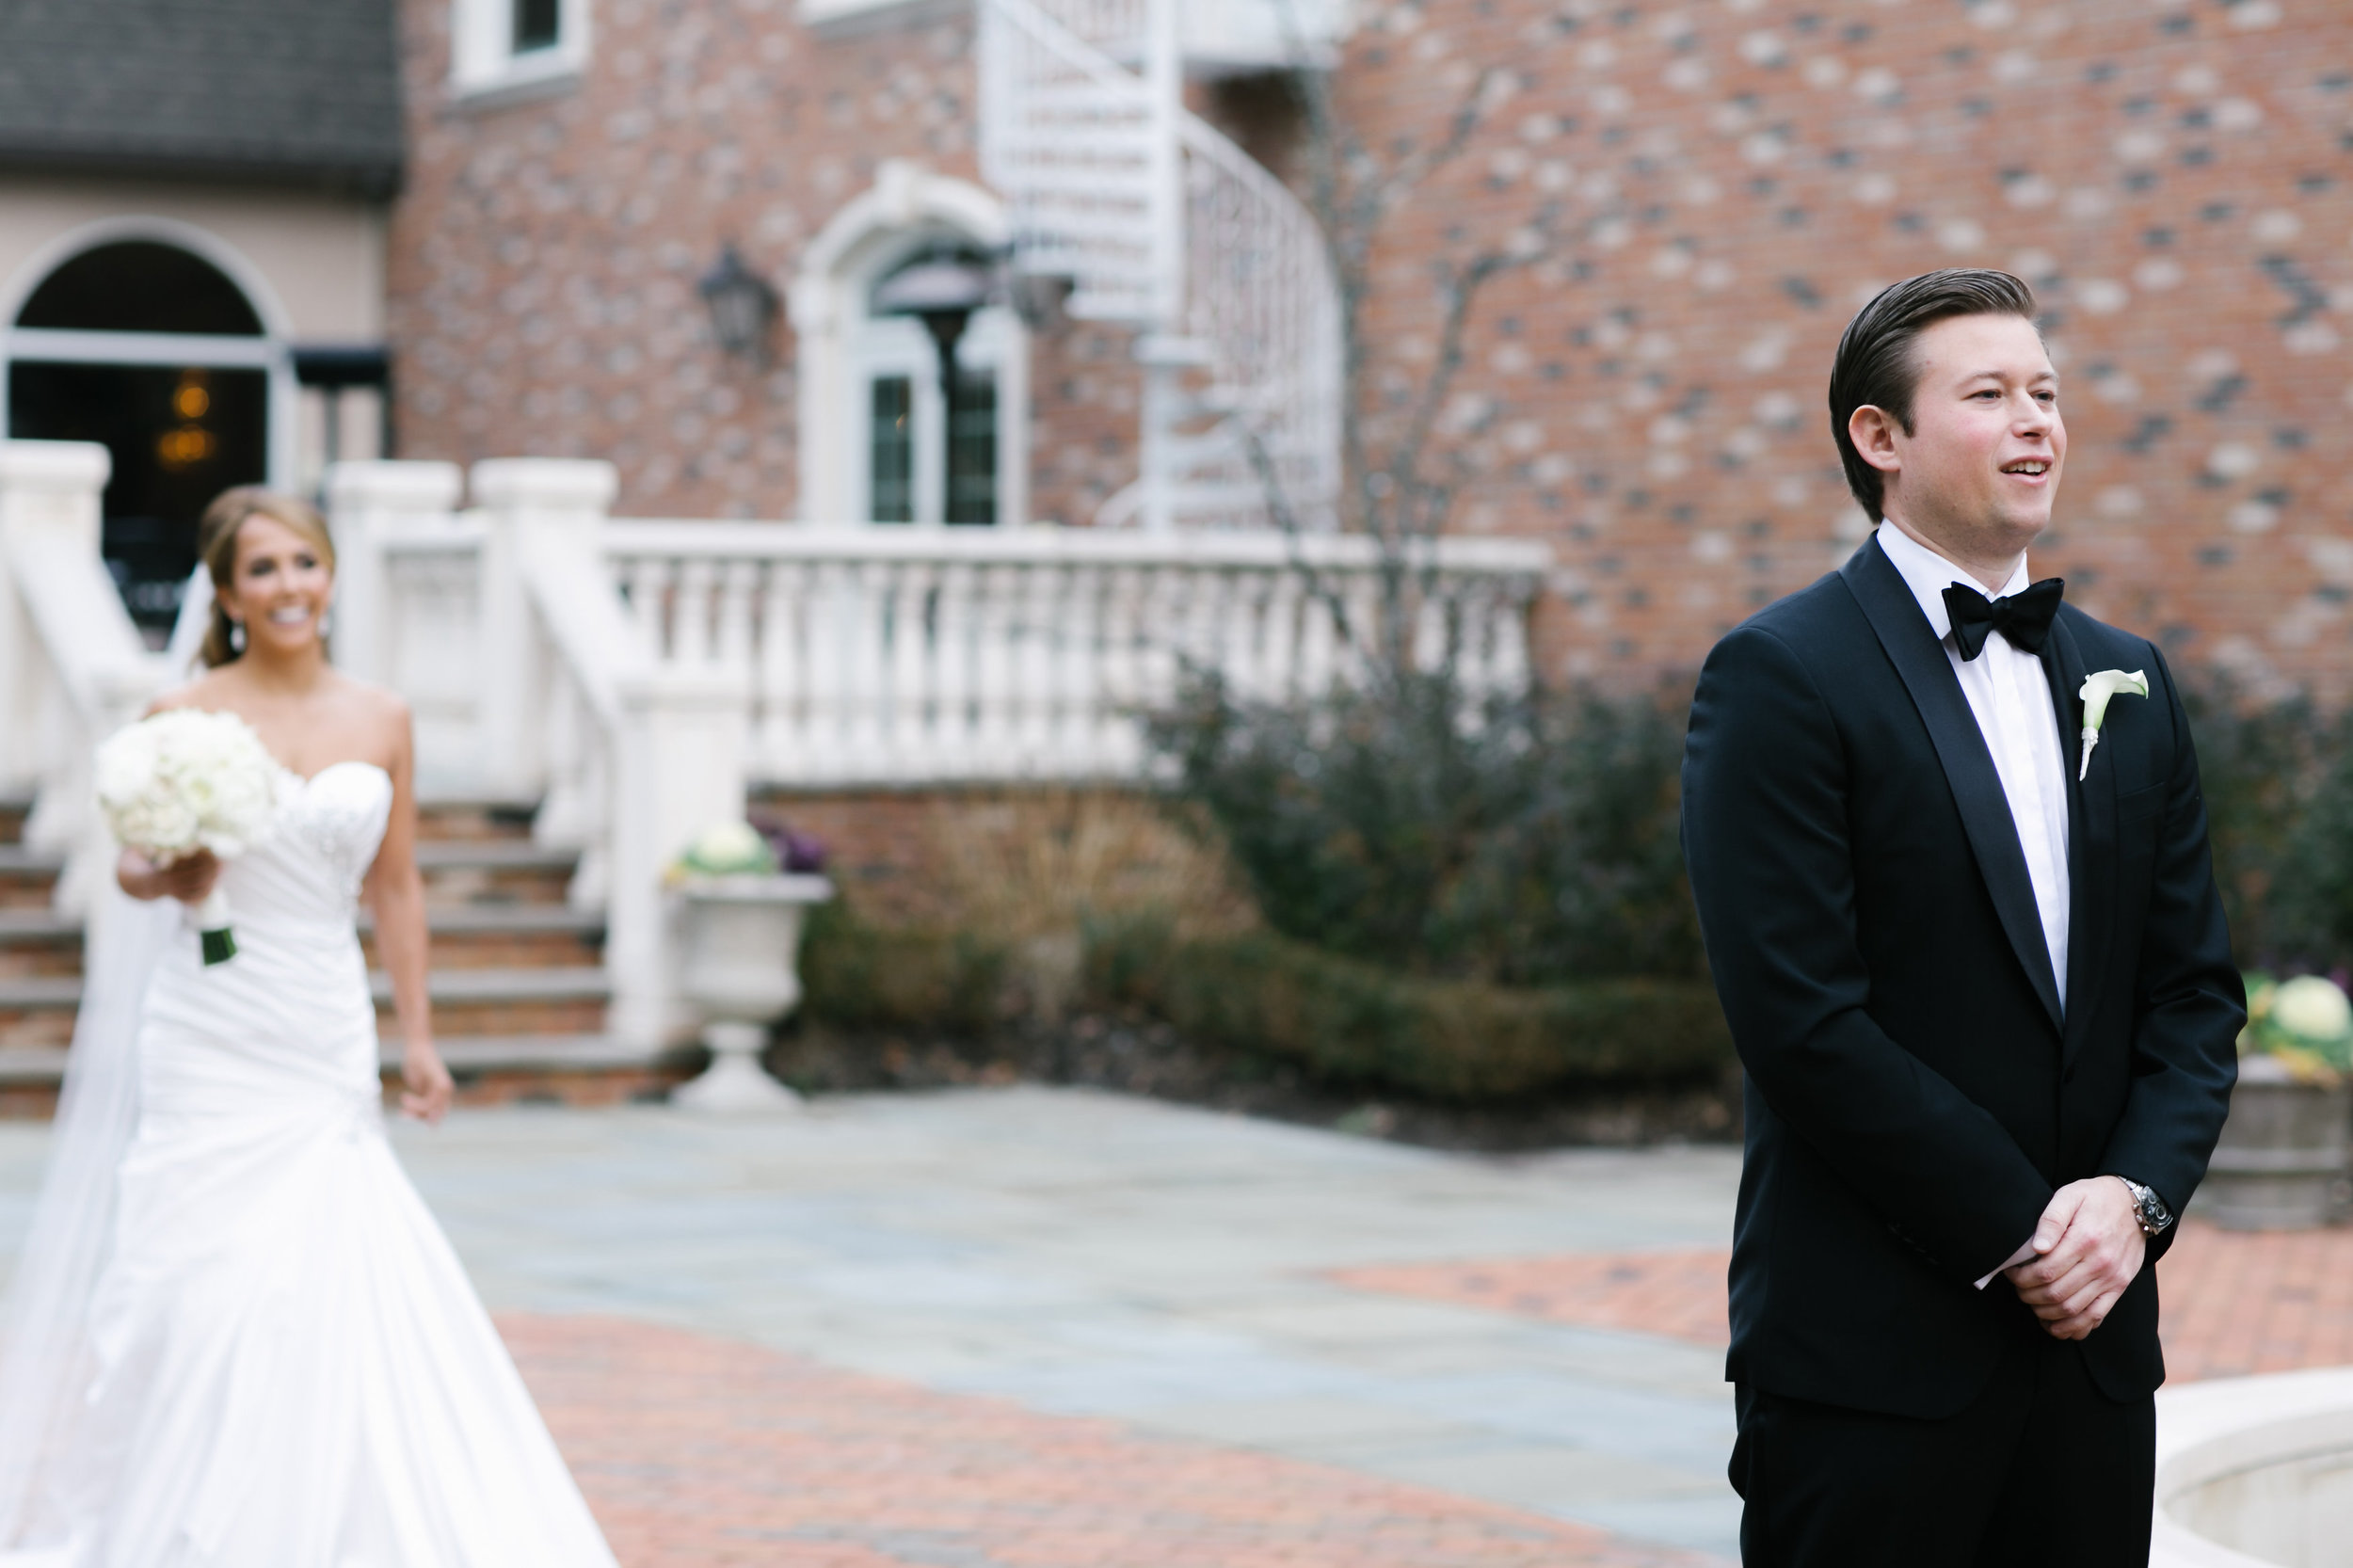 Ceci_New_York_Custom_Invitation_ New_Jersey_Wedding_Luxury_Personalized_Ceci_Style_Bride_Foil_Stamping22.jpg